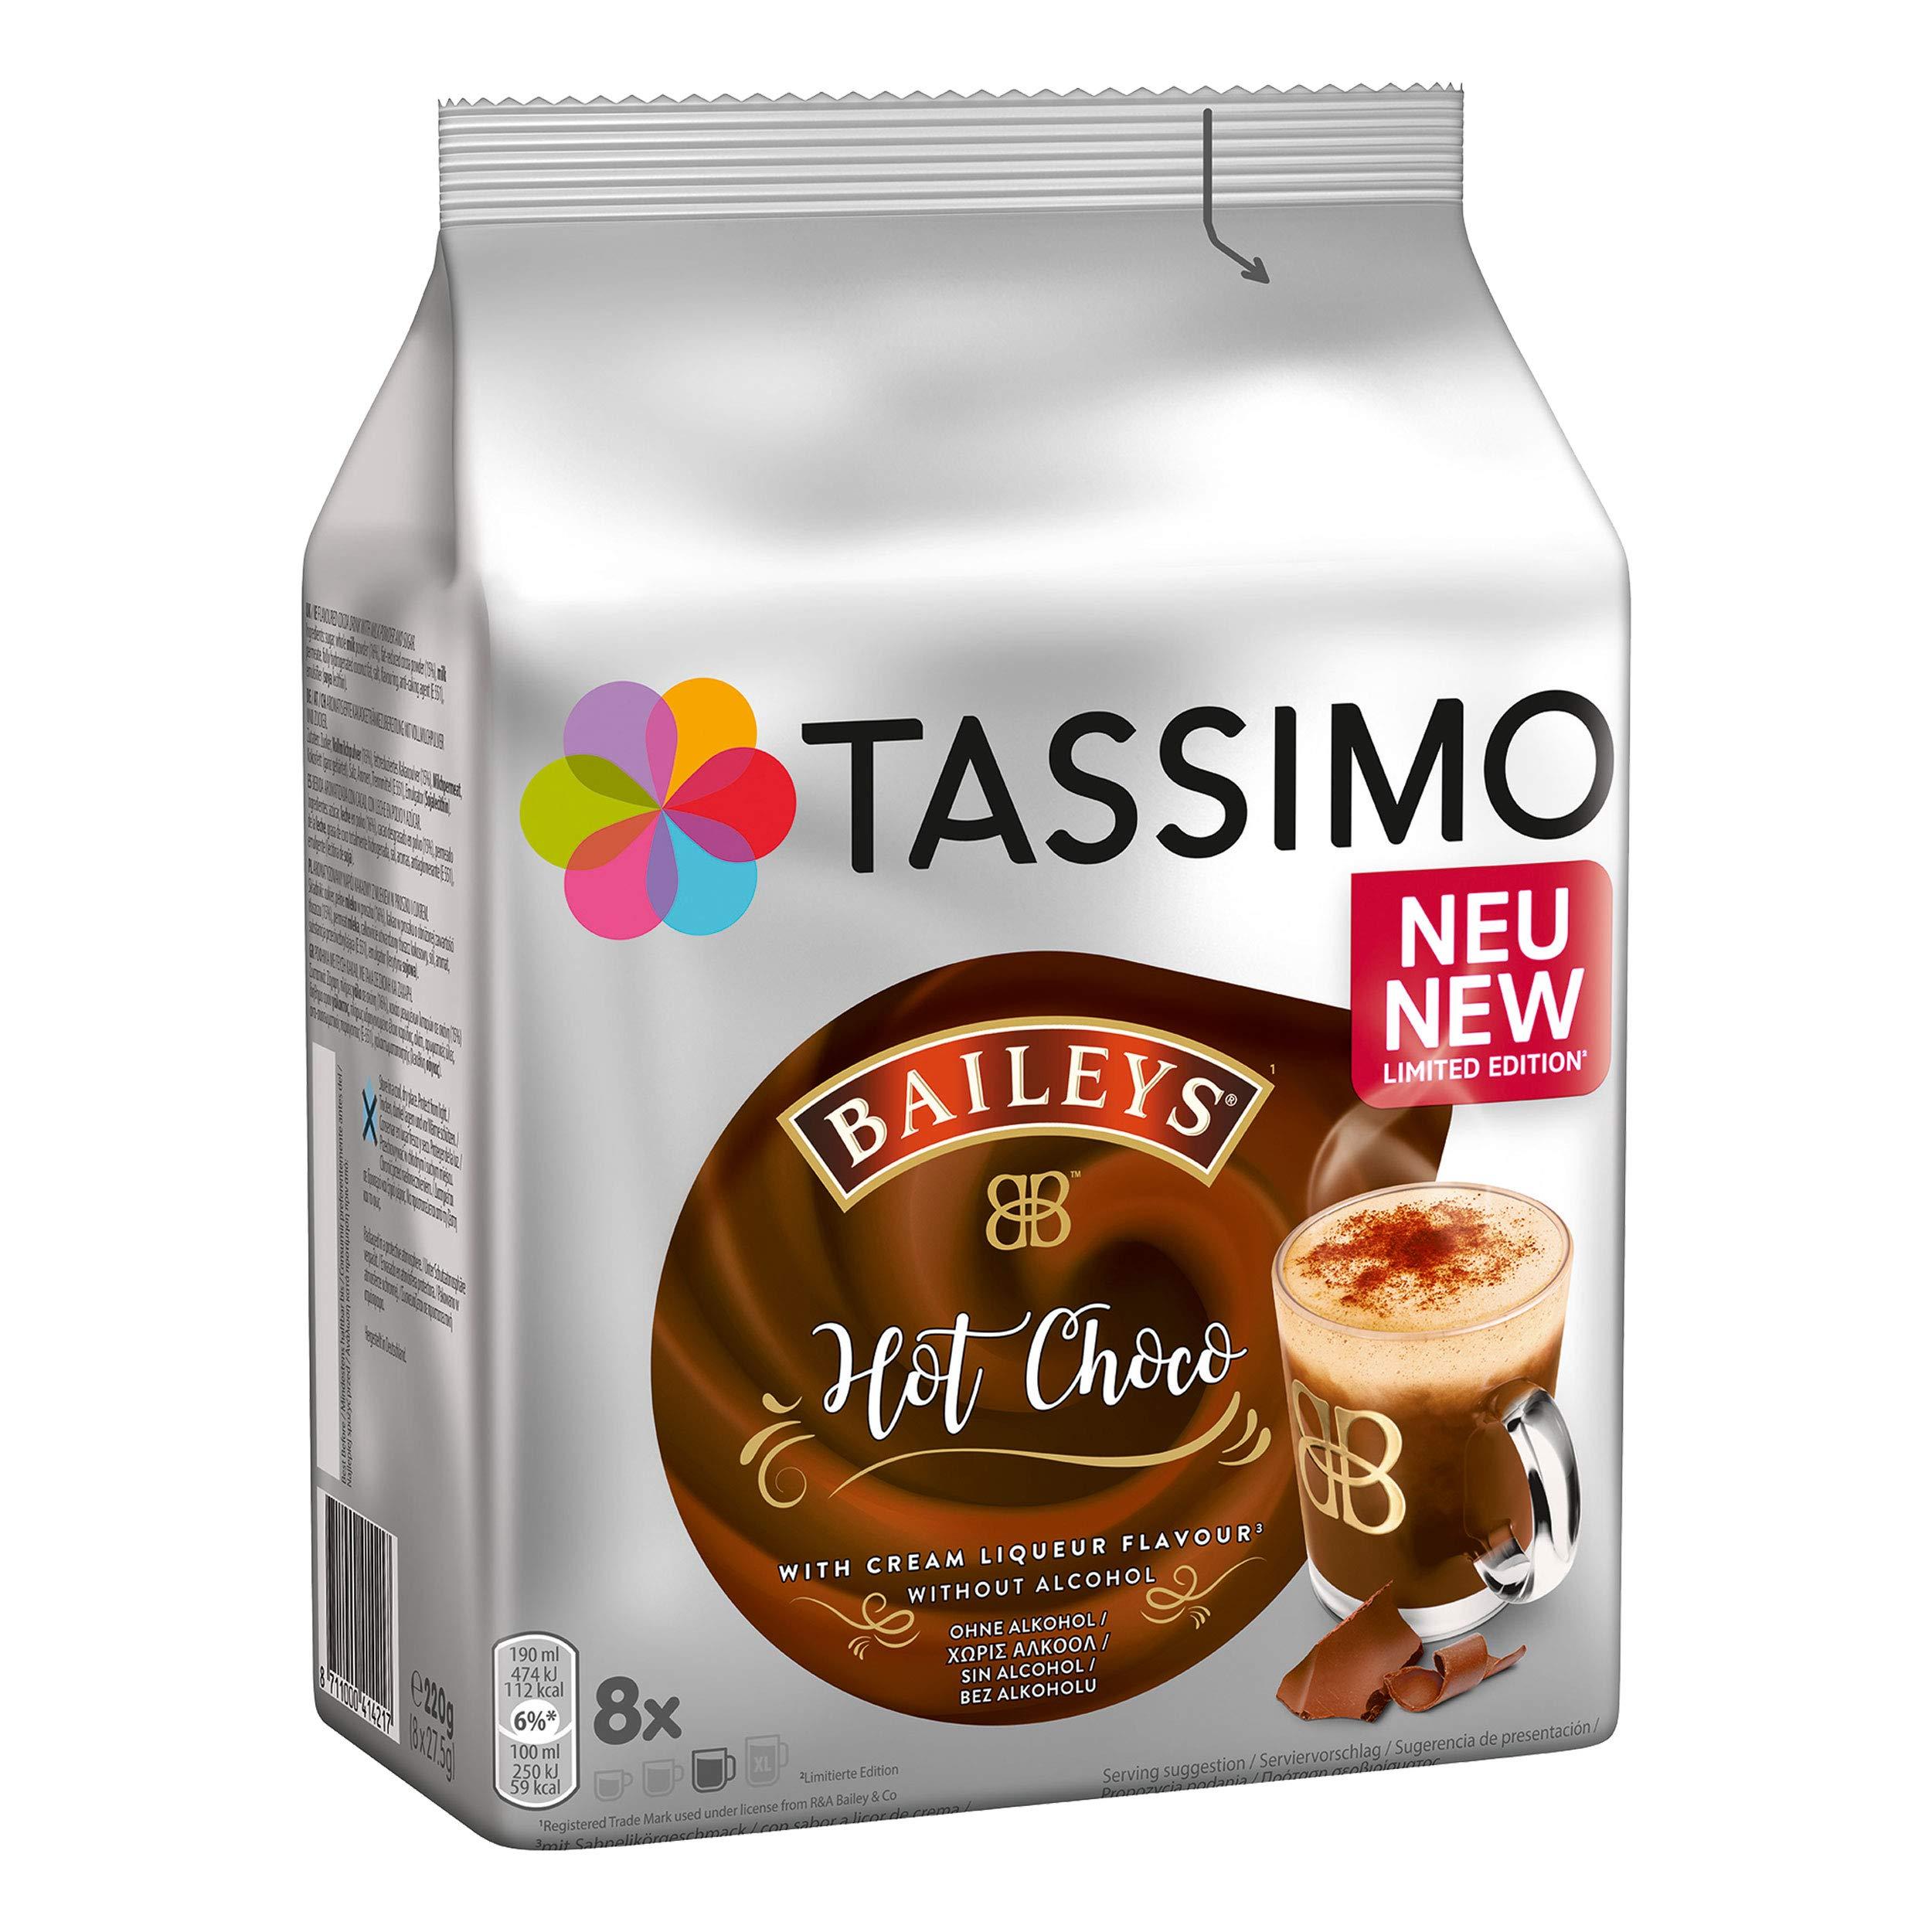 Tassimo Baileys Hot Choco Hot Choco Cocoa Chocolate Drink